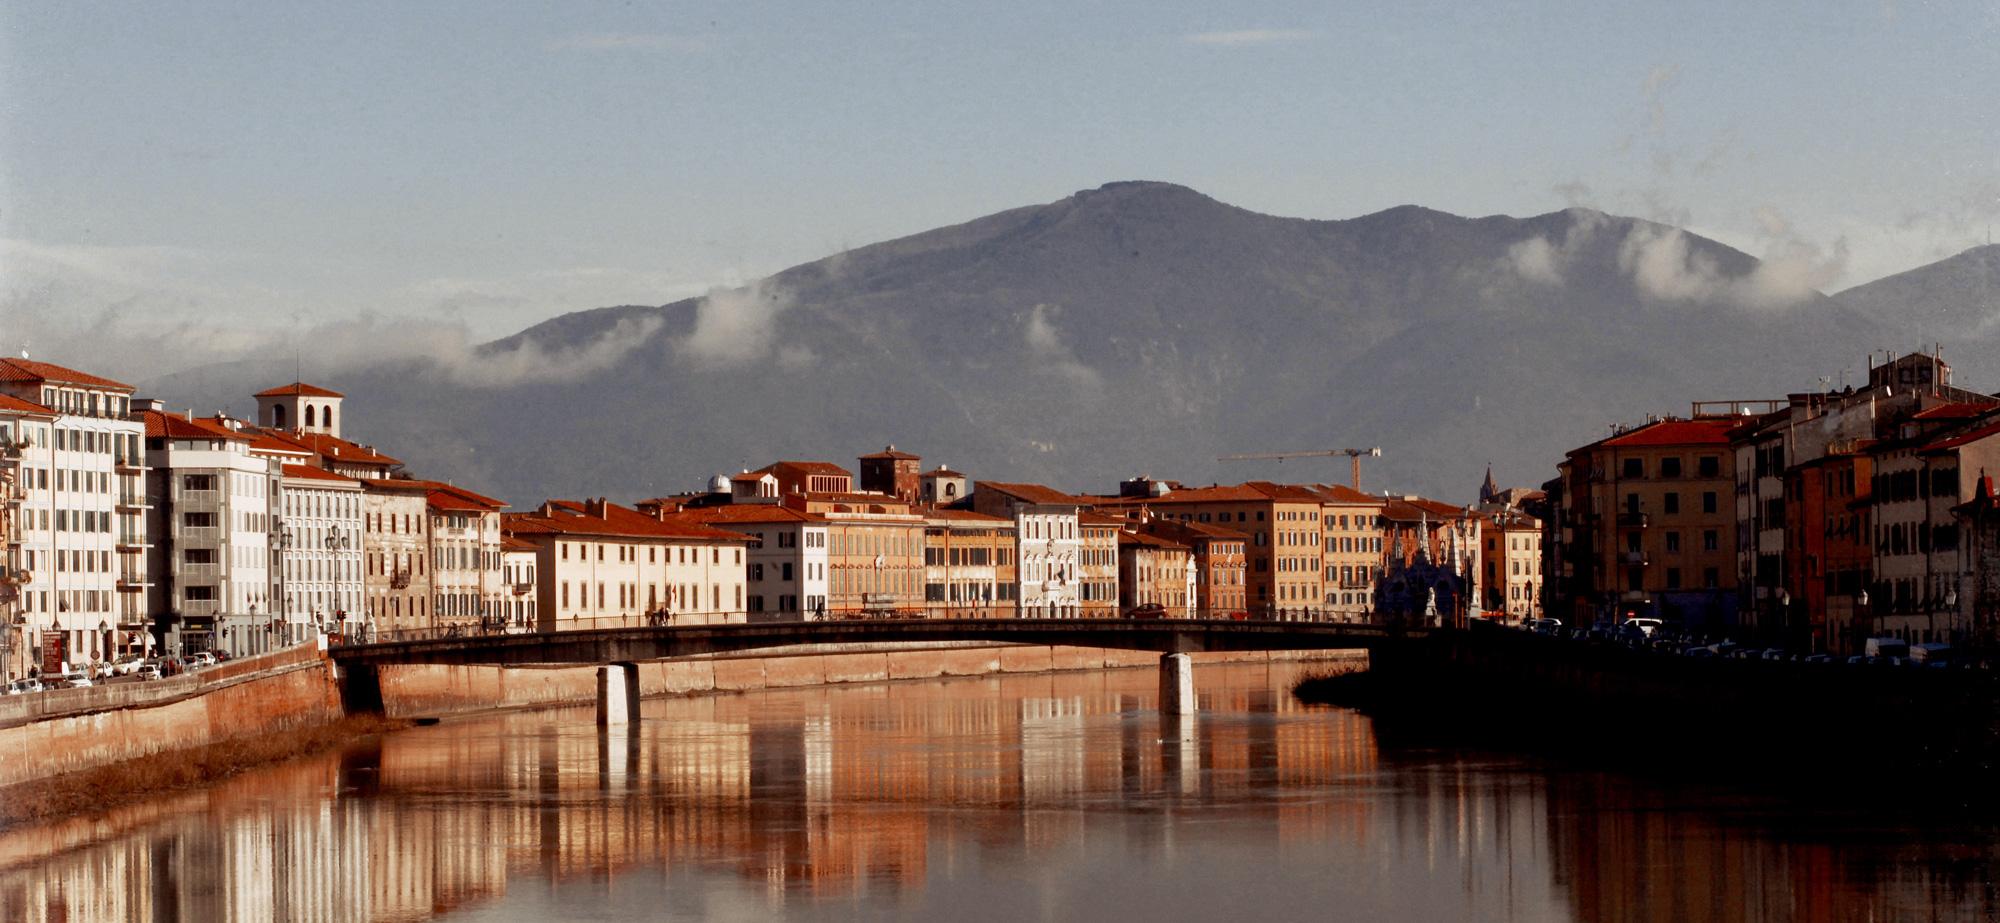 tour-like-a-local-monte-pisano